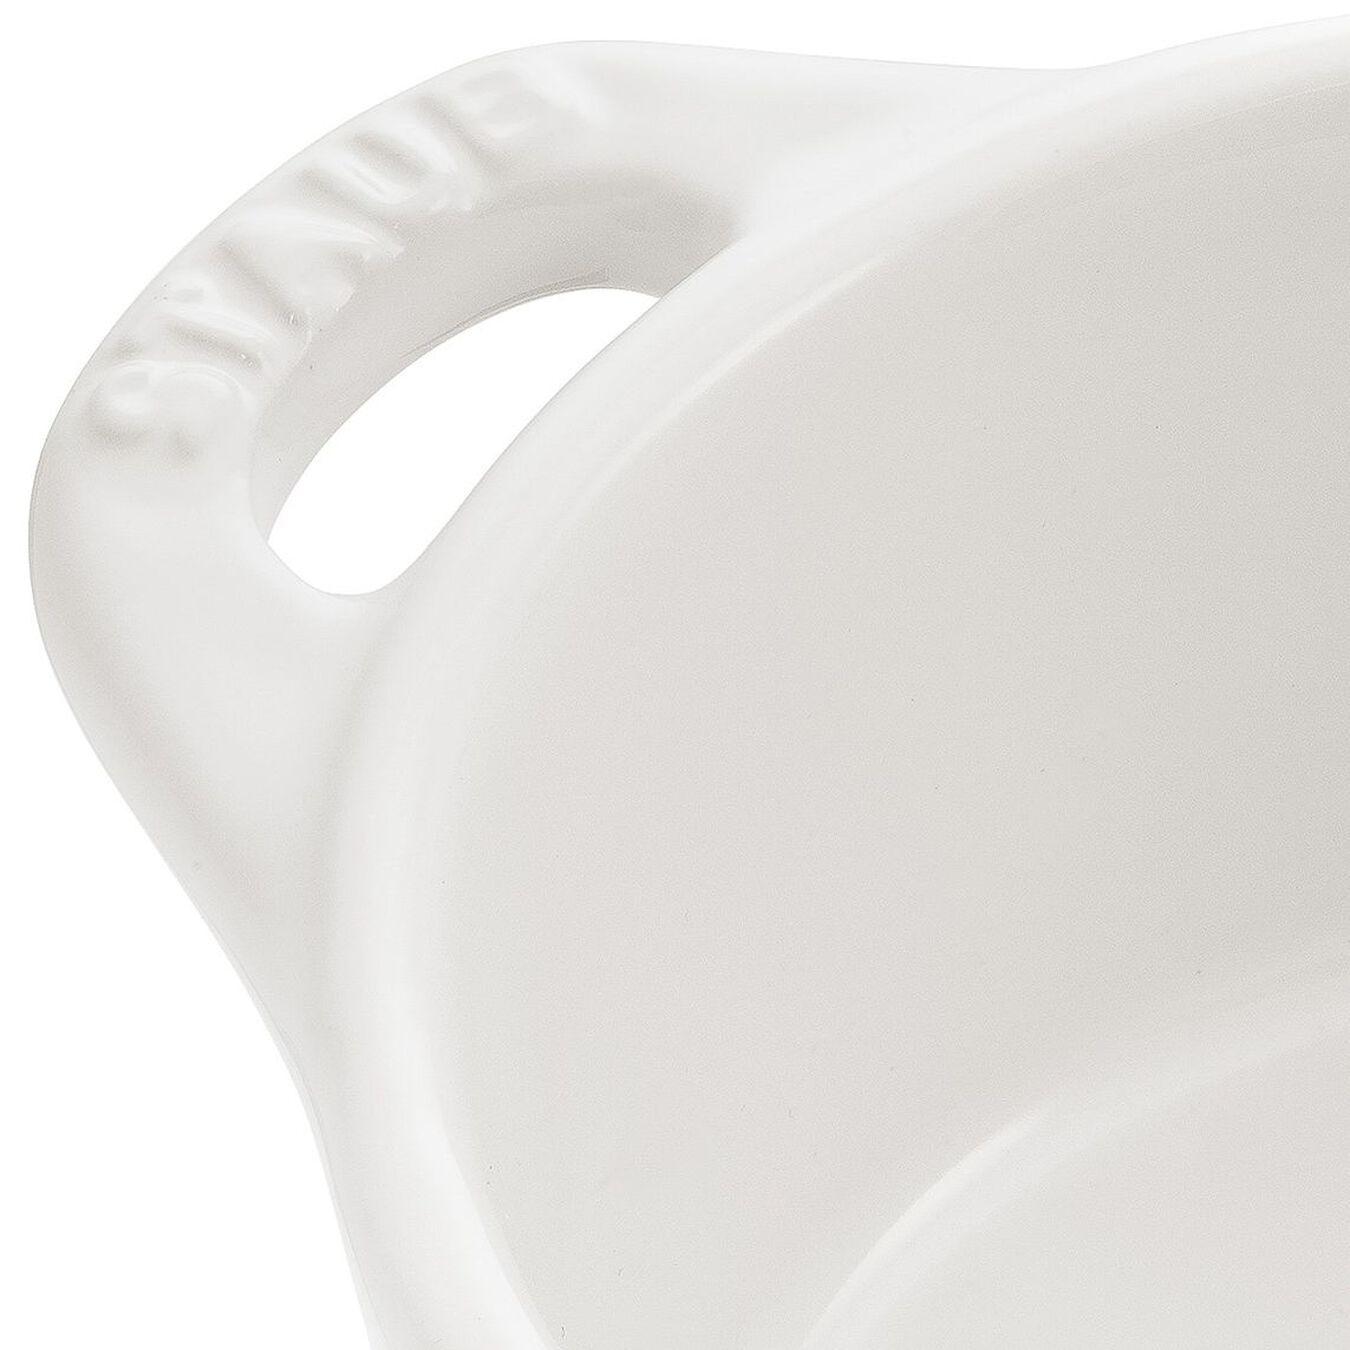 Mini Cocotte 10 cm, rund, Reinweiß, Keramik,,large 2